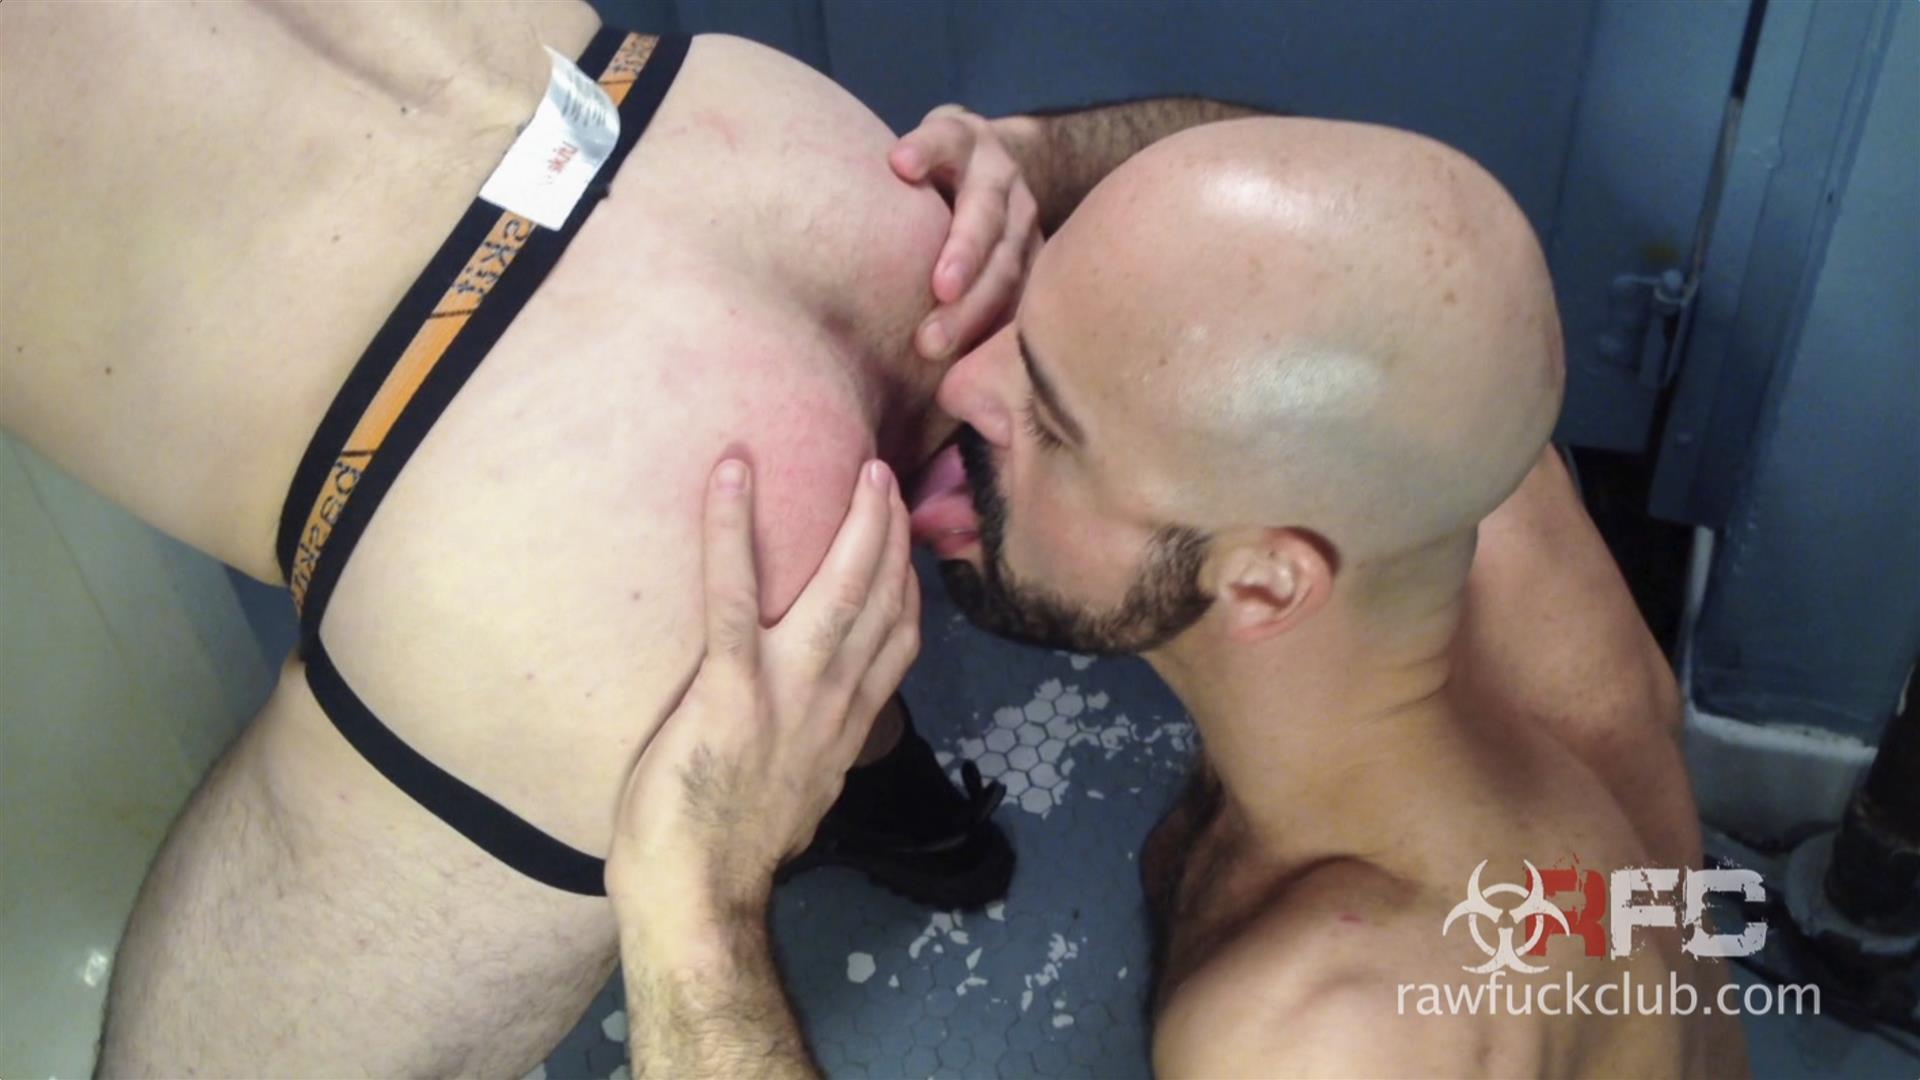 Raw-Fuck-Club-Adam-Russo-and-Kyle-Ferris-Anonymous-Bareback-Sex-Amateur-Gay-Porn-4 Adam Russo Barebacking A Stranger In A Dirty Bar Bathroom